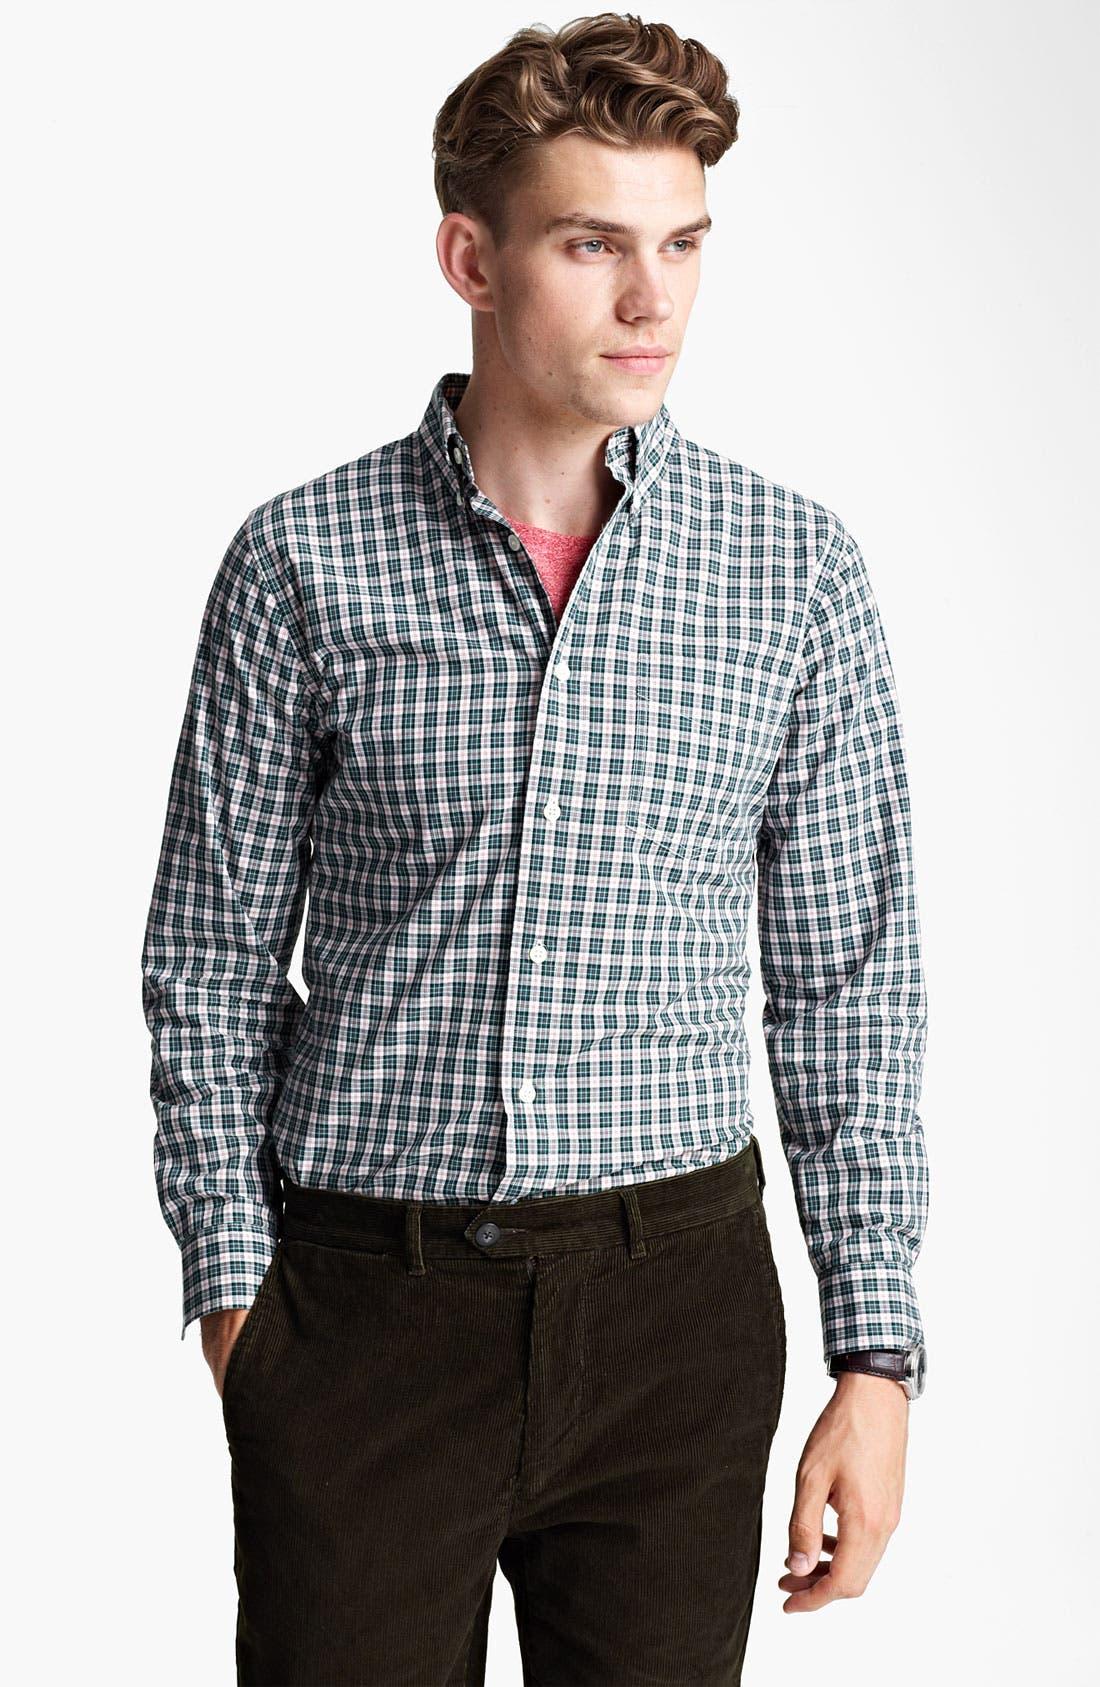 Main Image - Jack Spade 'Snyder' Check Woven Shirt